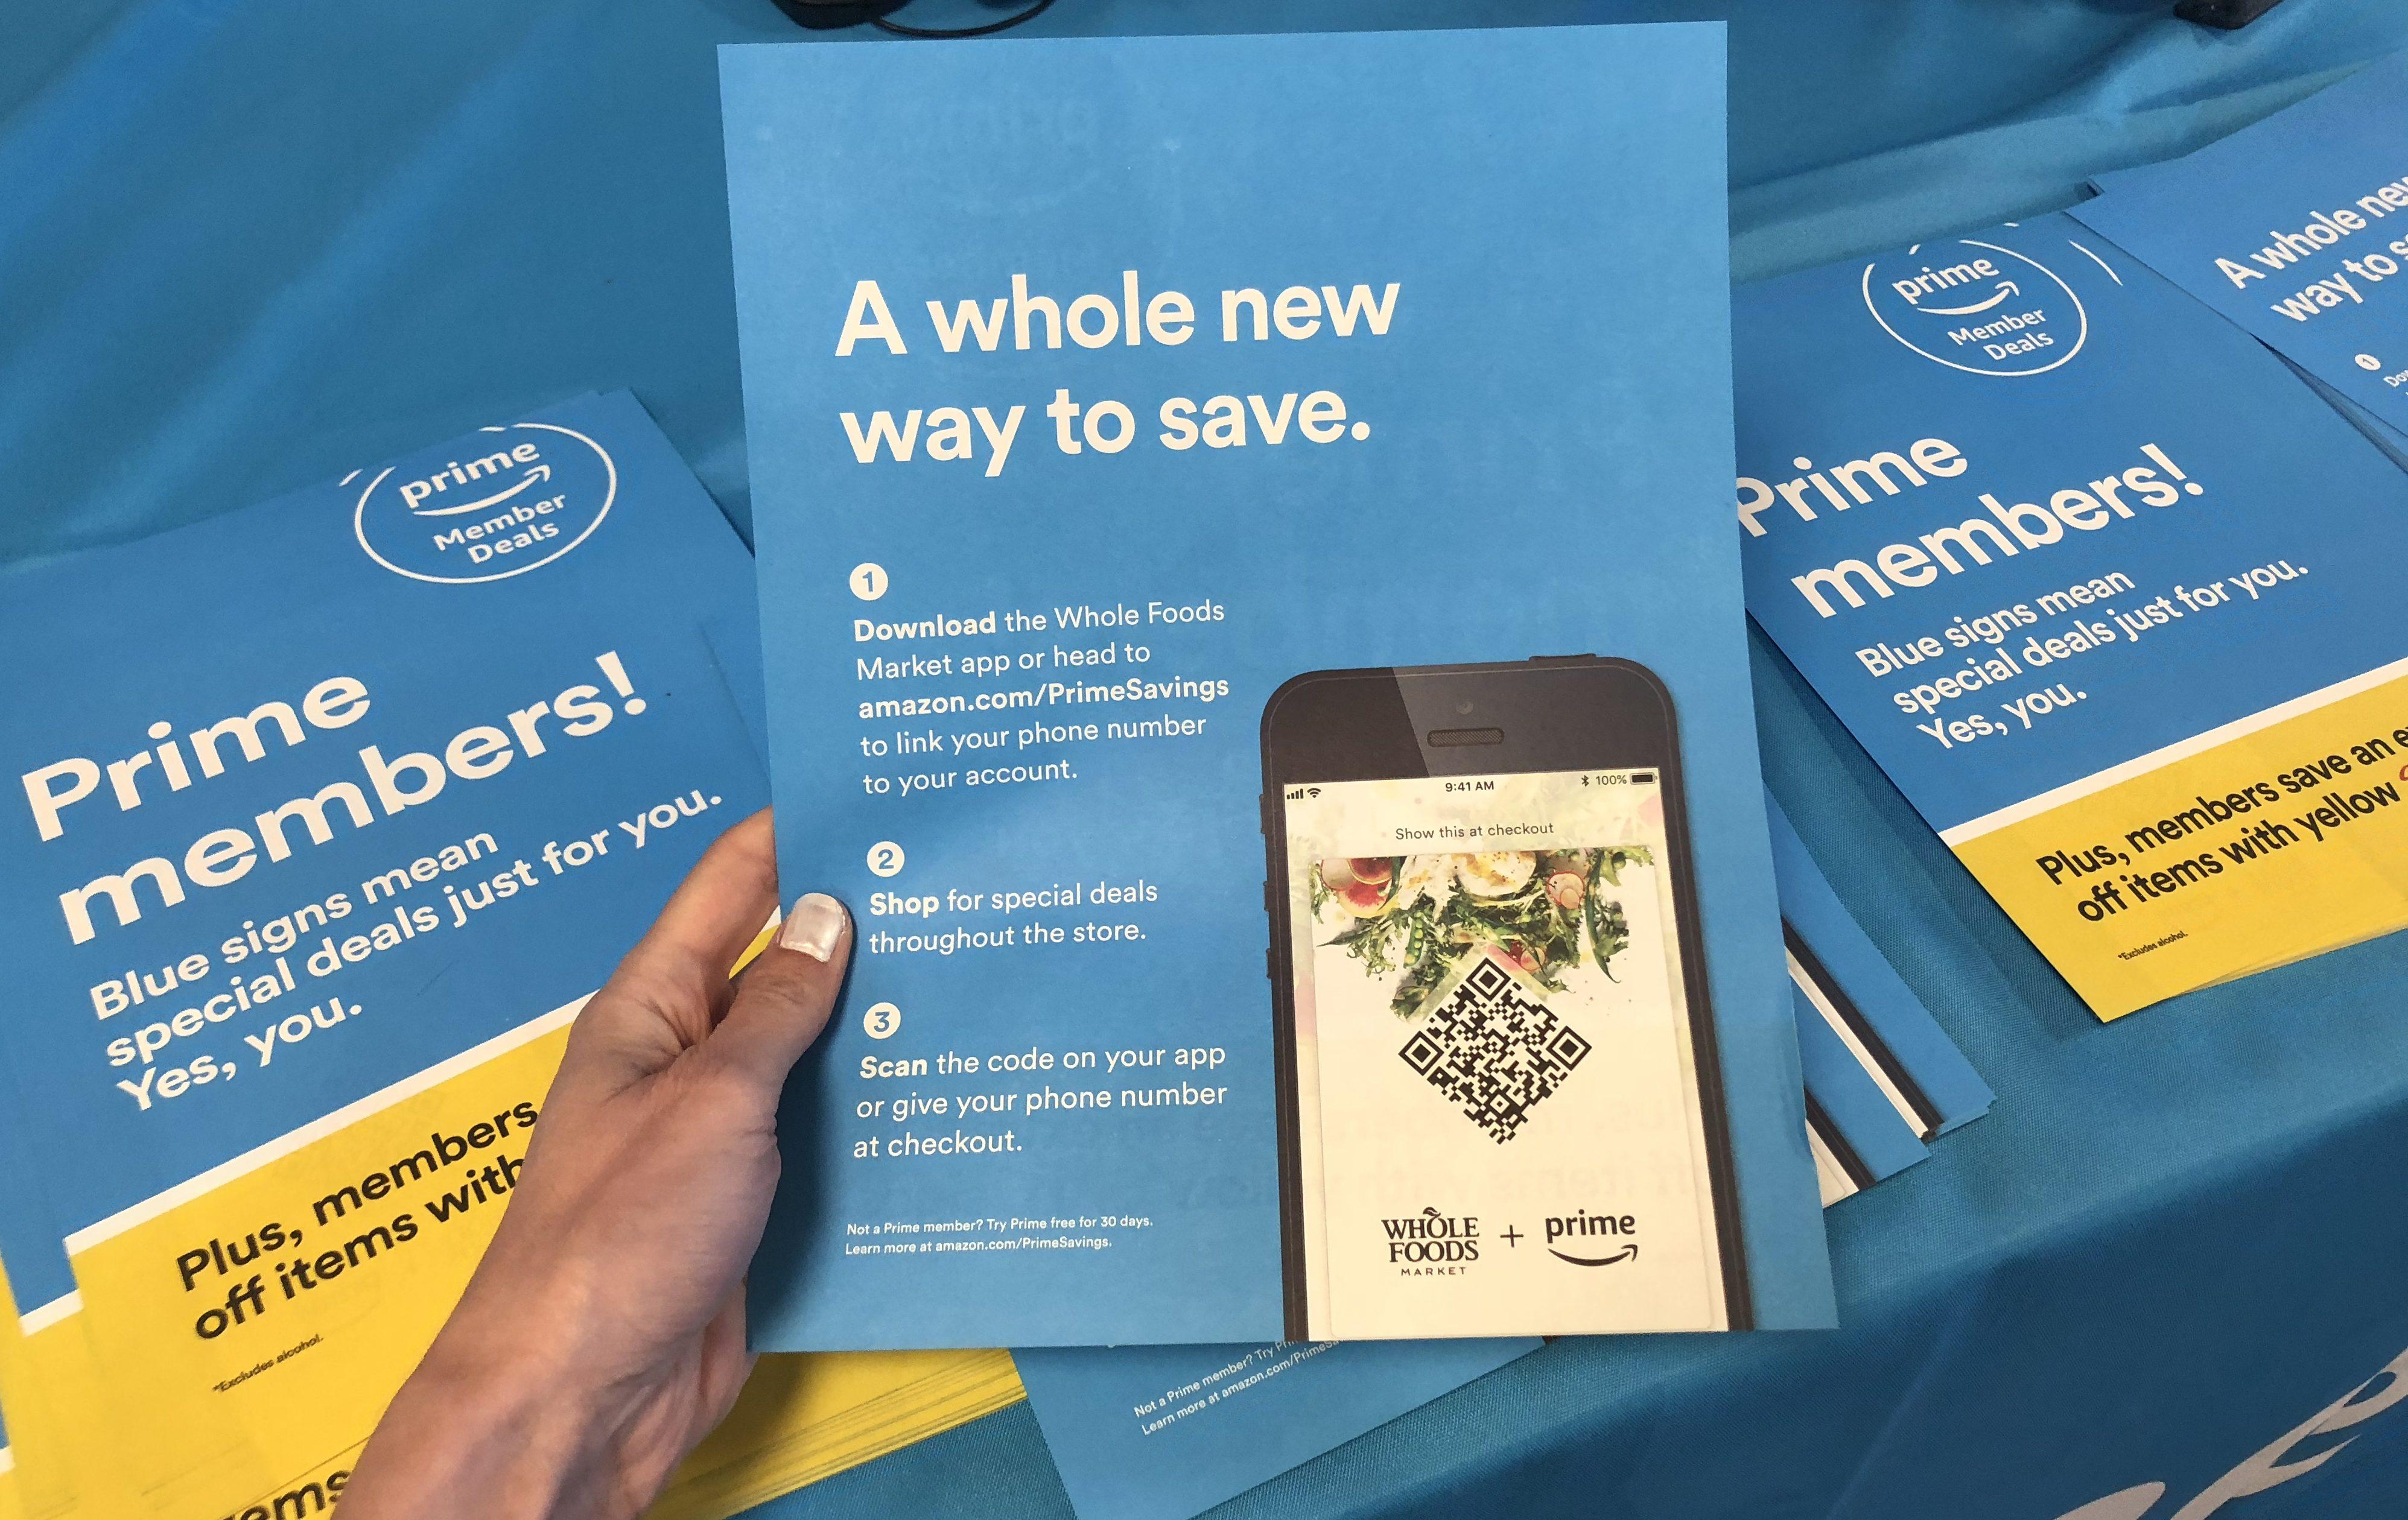 amazon prime sale whole foods - Amazon Whole Foods App flyer